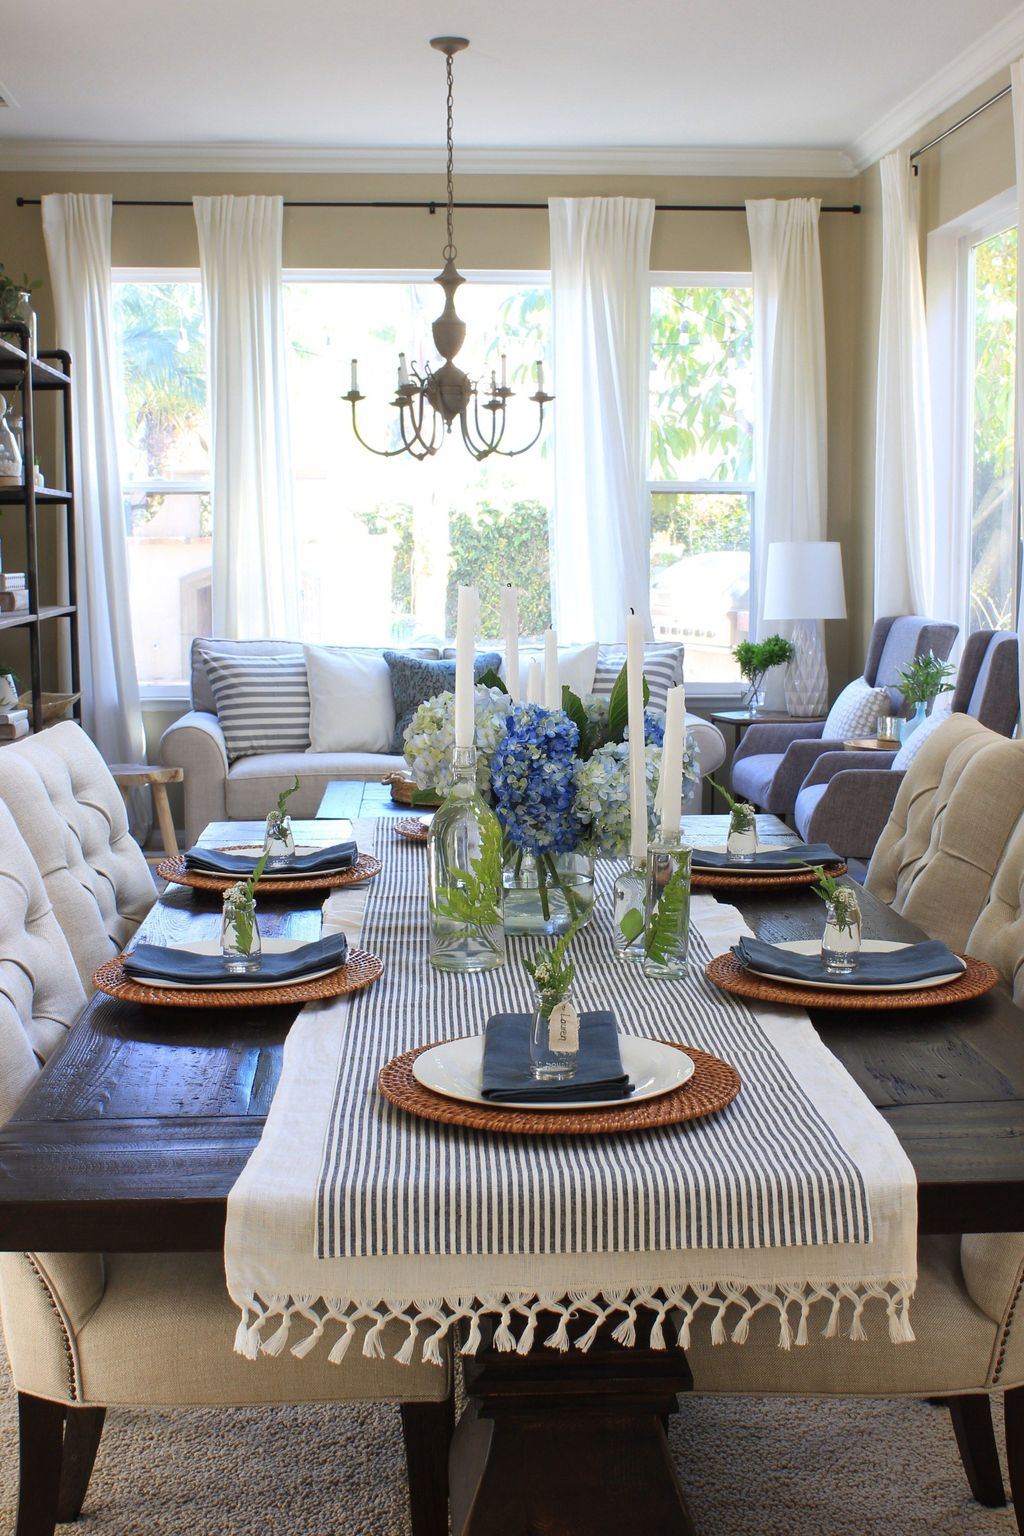 The Best Farmhouse Style Spring Tablescape Decor Ideas 09